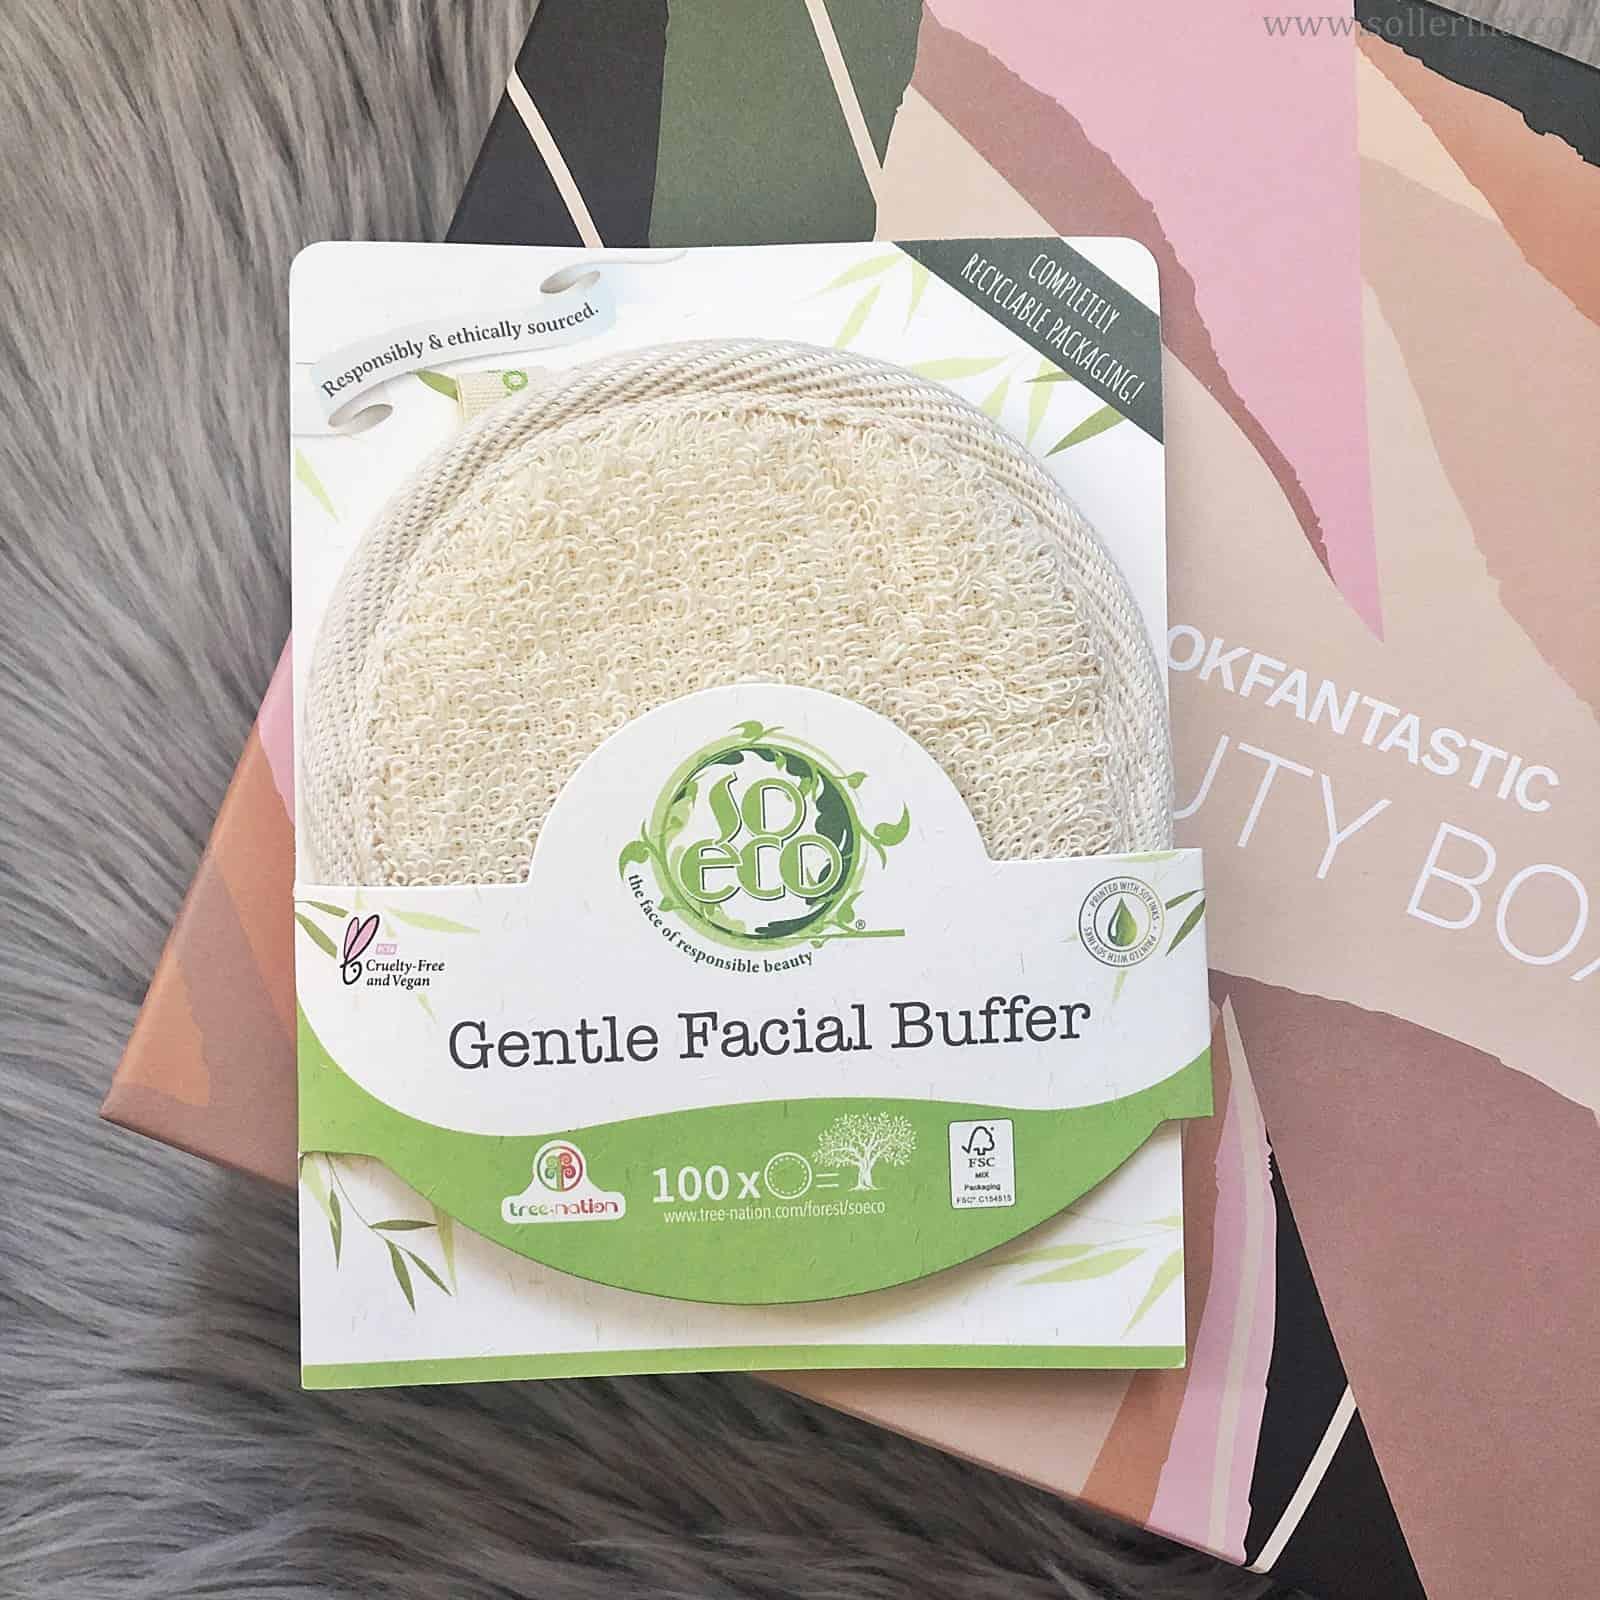 So Eco – Gentle Facial Buffer